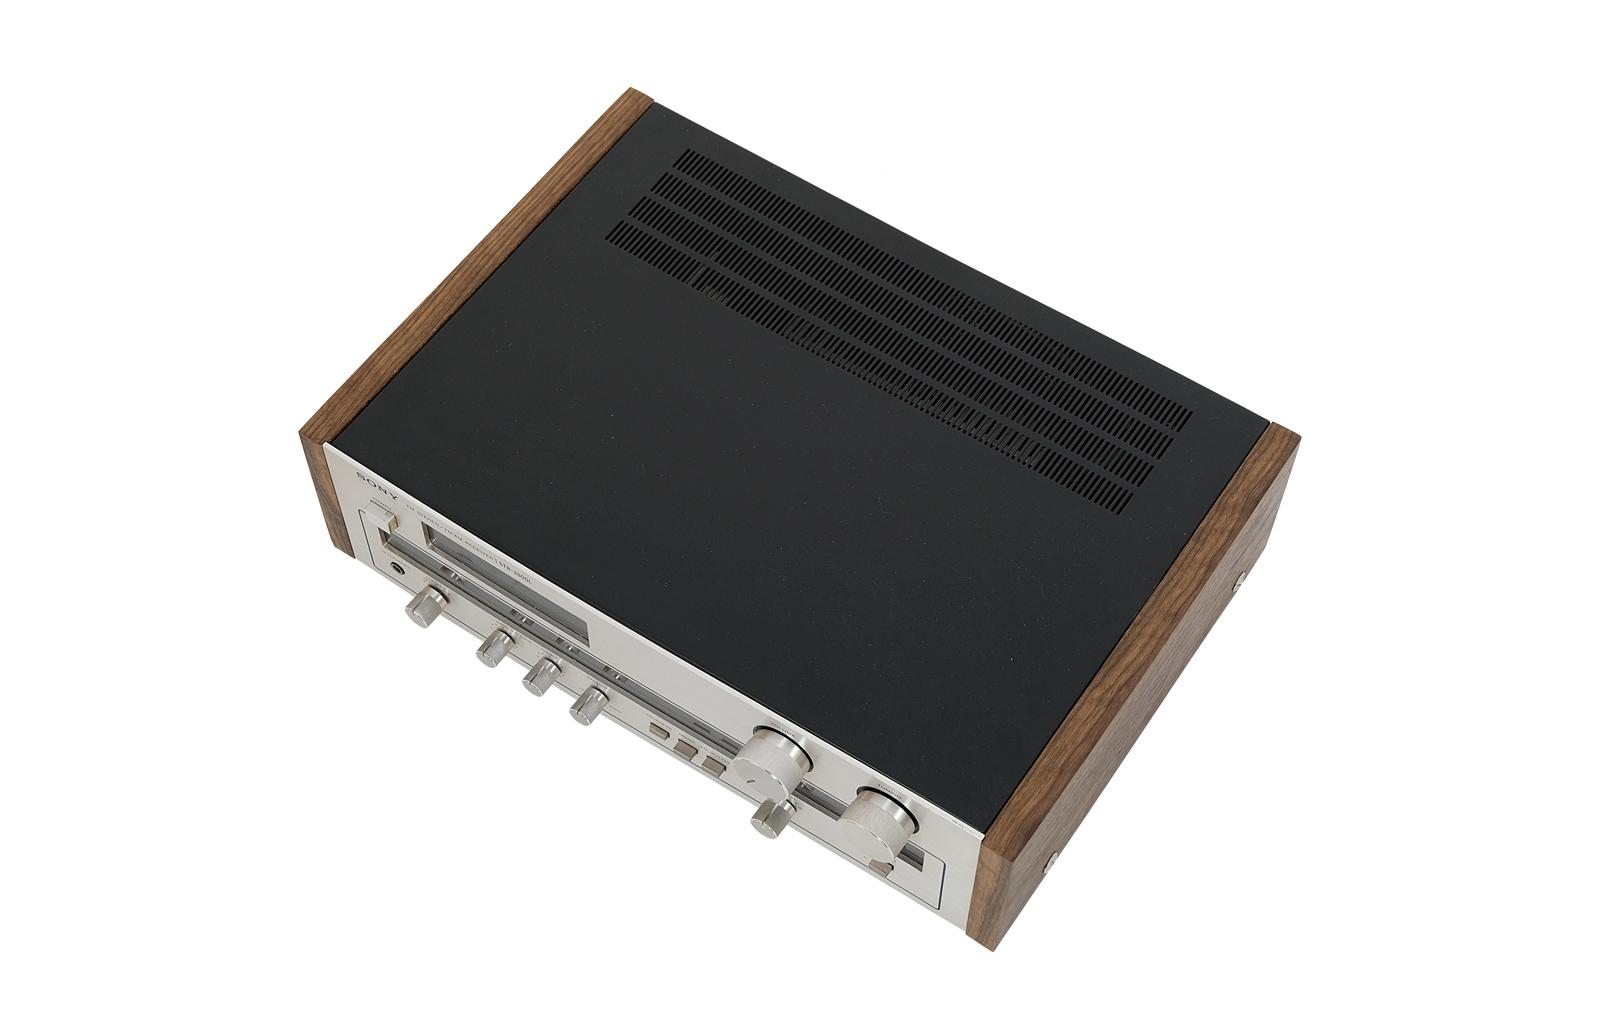 Sony STR 2800